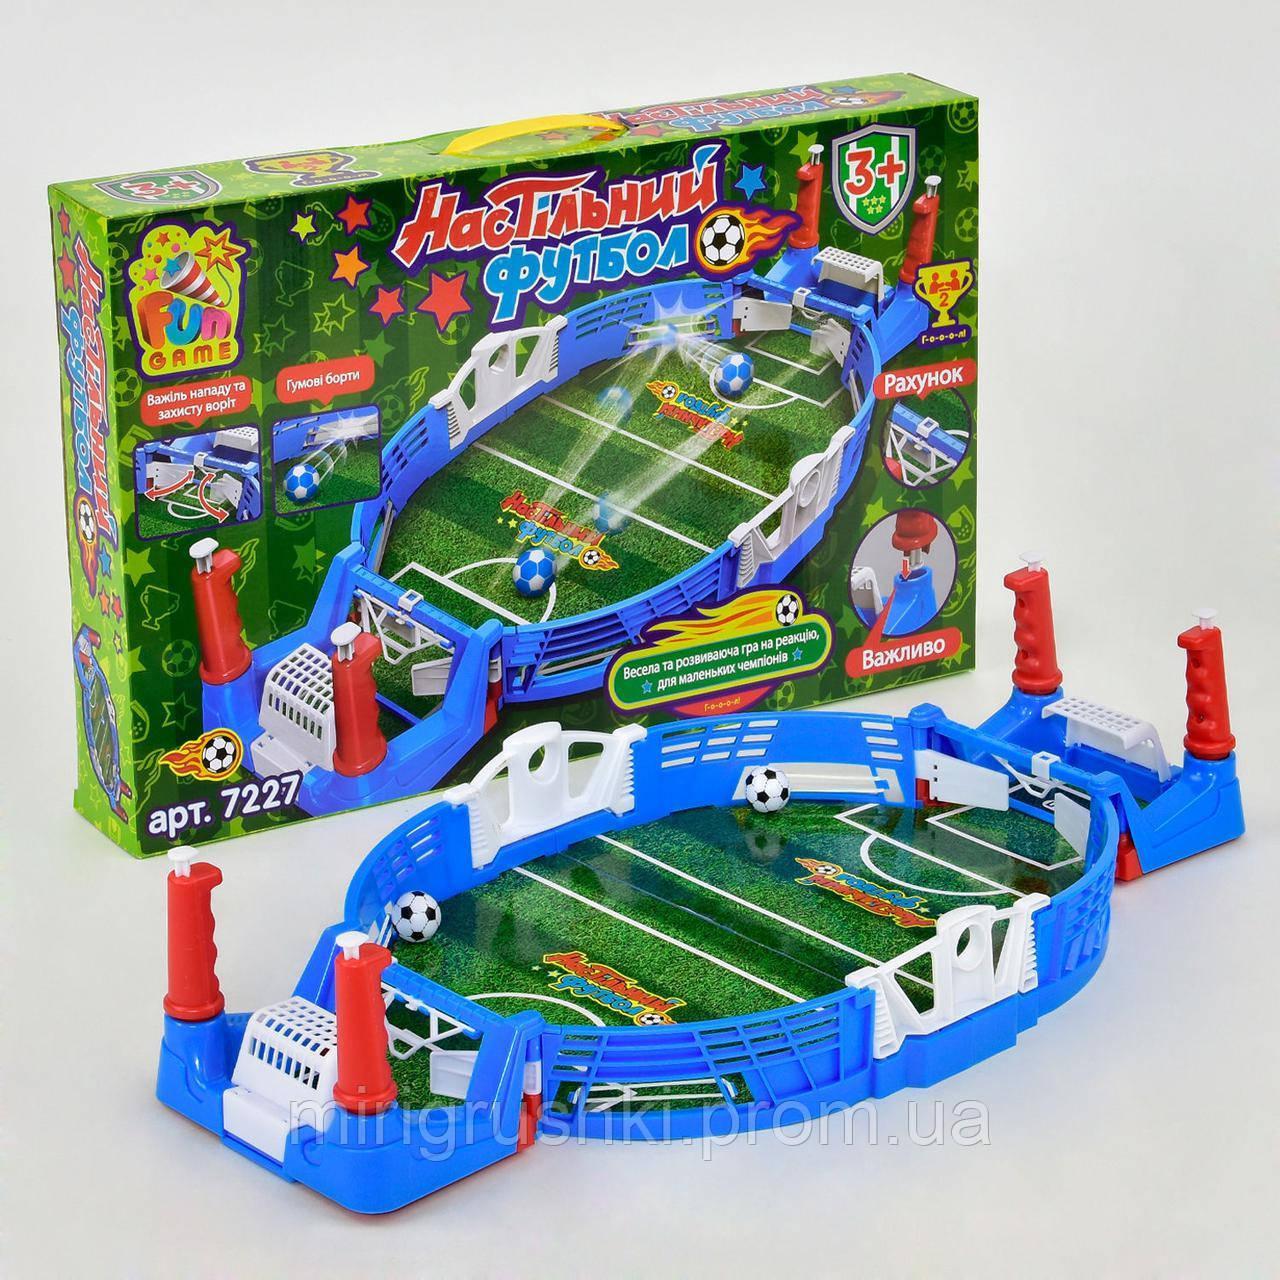 "Игра ""Футбол"" в коробке ""FUN GAME"" 64929 (7227) M"